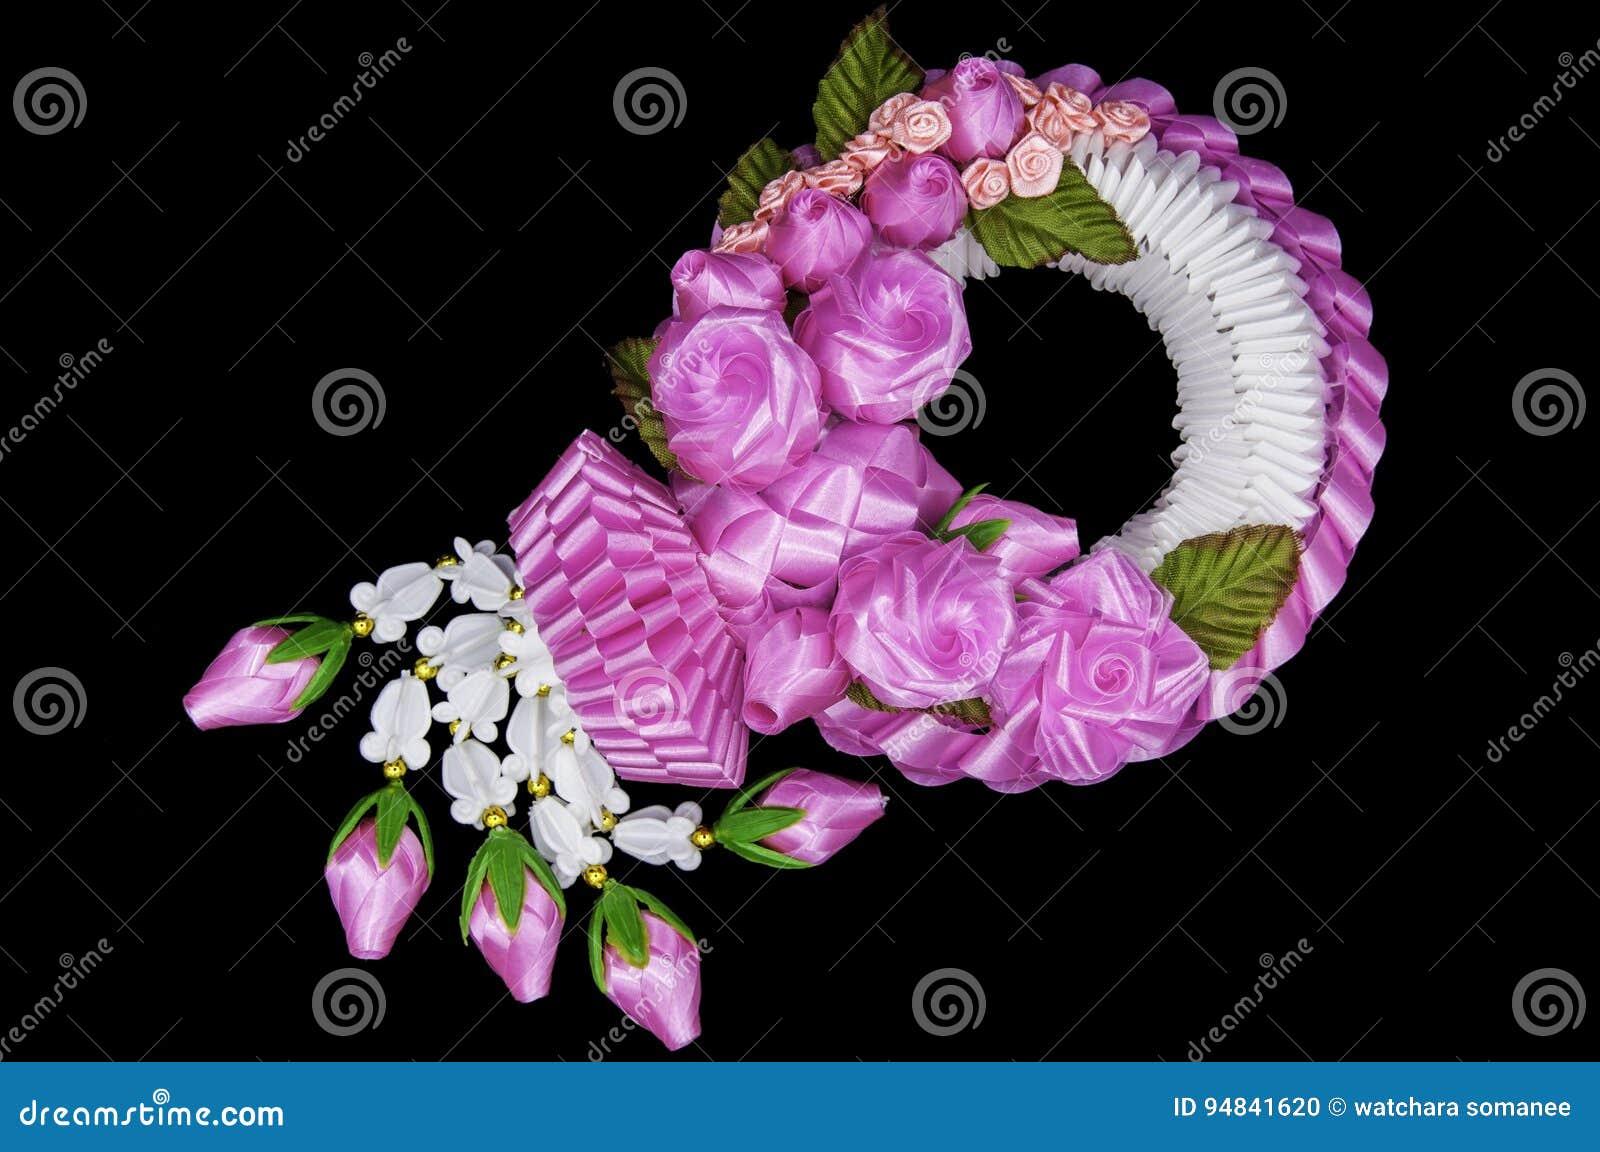 Jasmine and pink flower garlands stock photo image of background download jasmine and pink flower garlands stock photo image of background thai 94841620 mightylinksfo